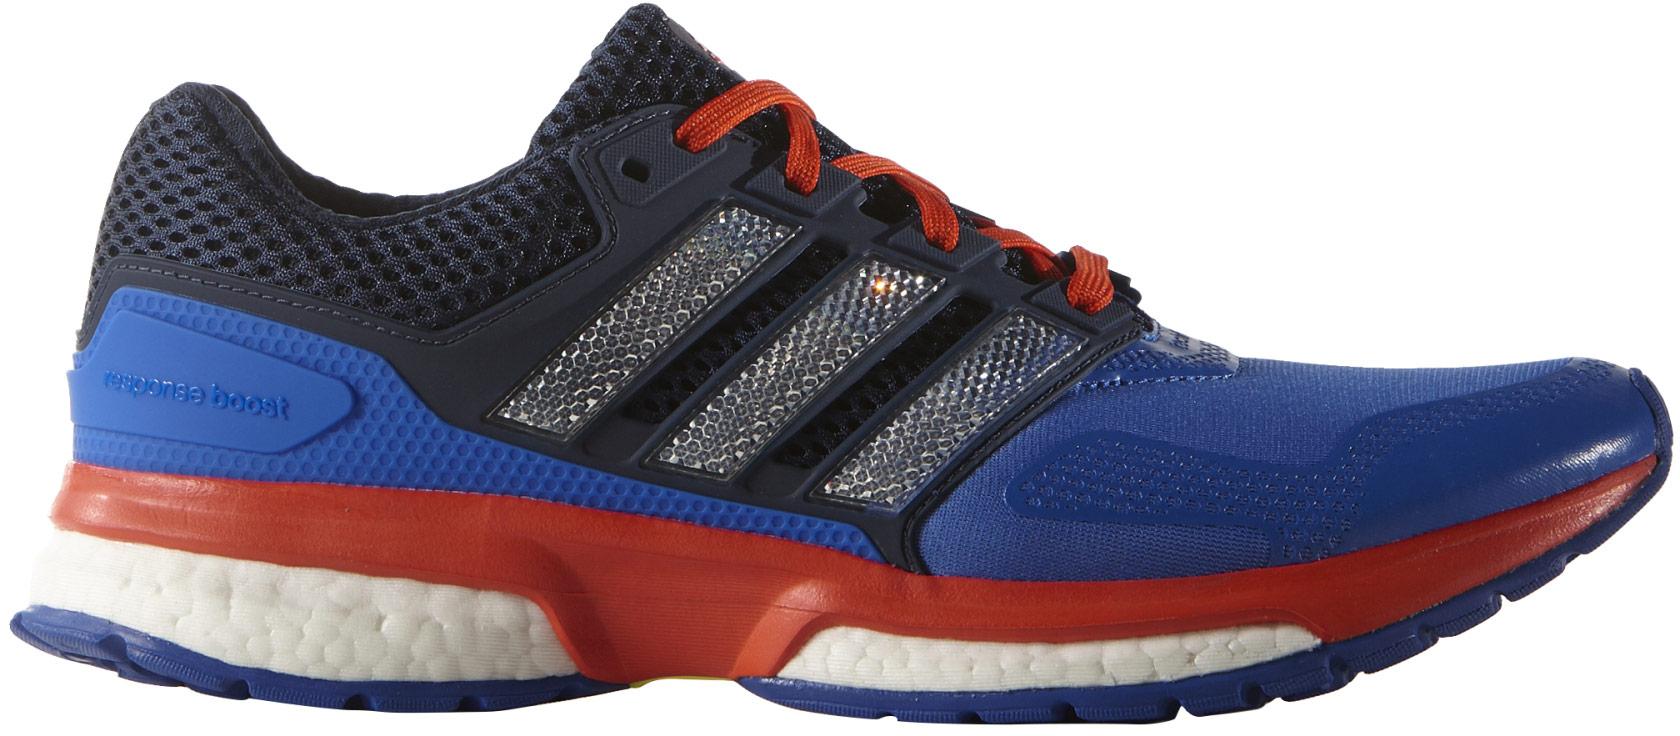 Adidas Response Boost M